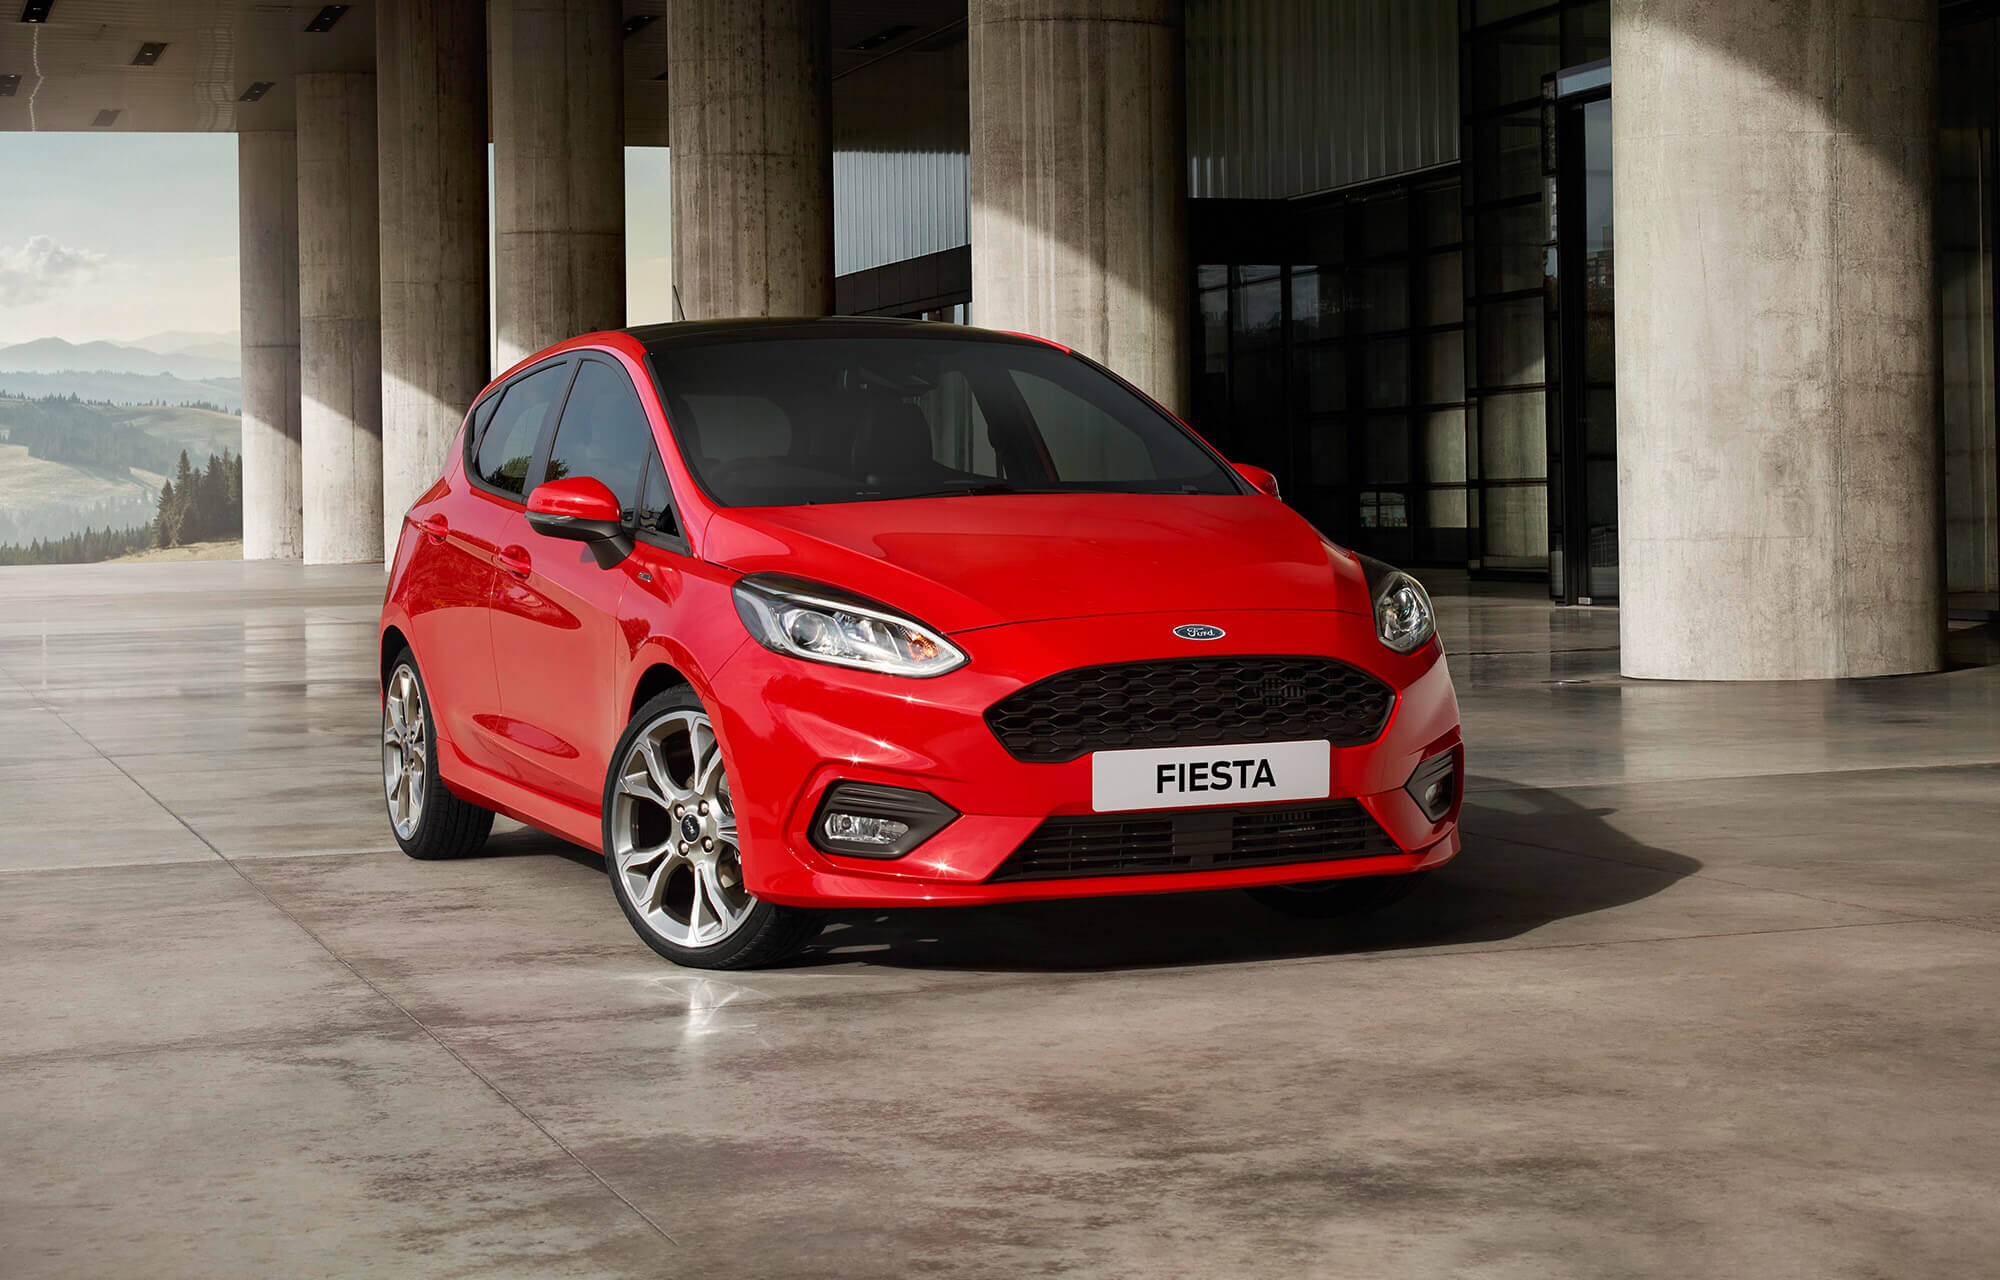 Ford Fiesta Supagard